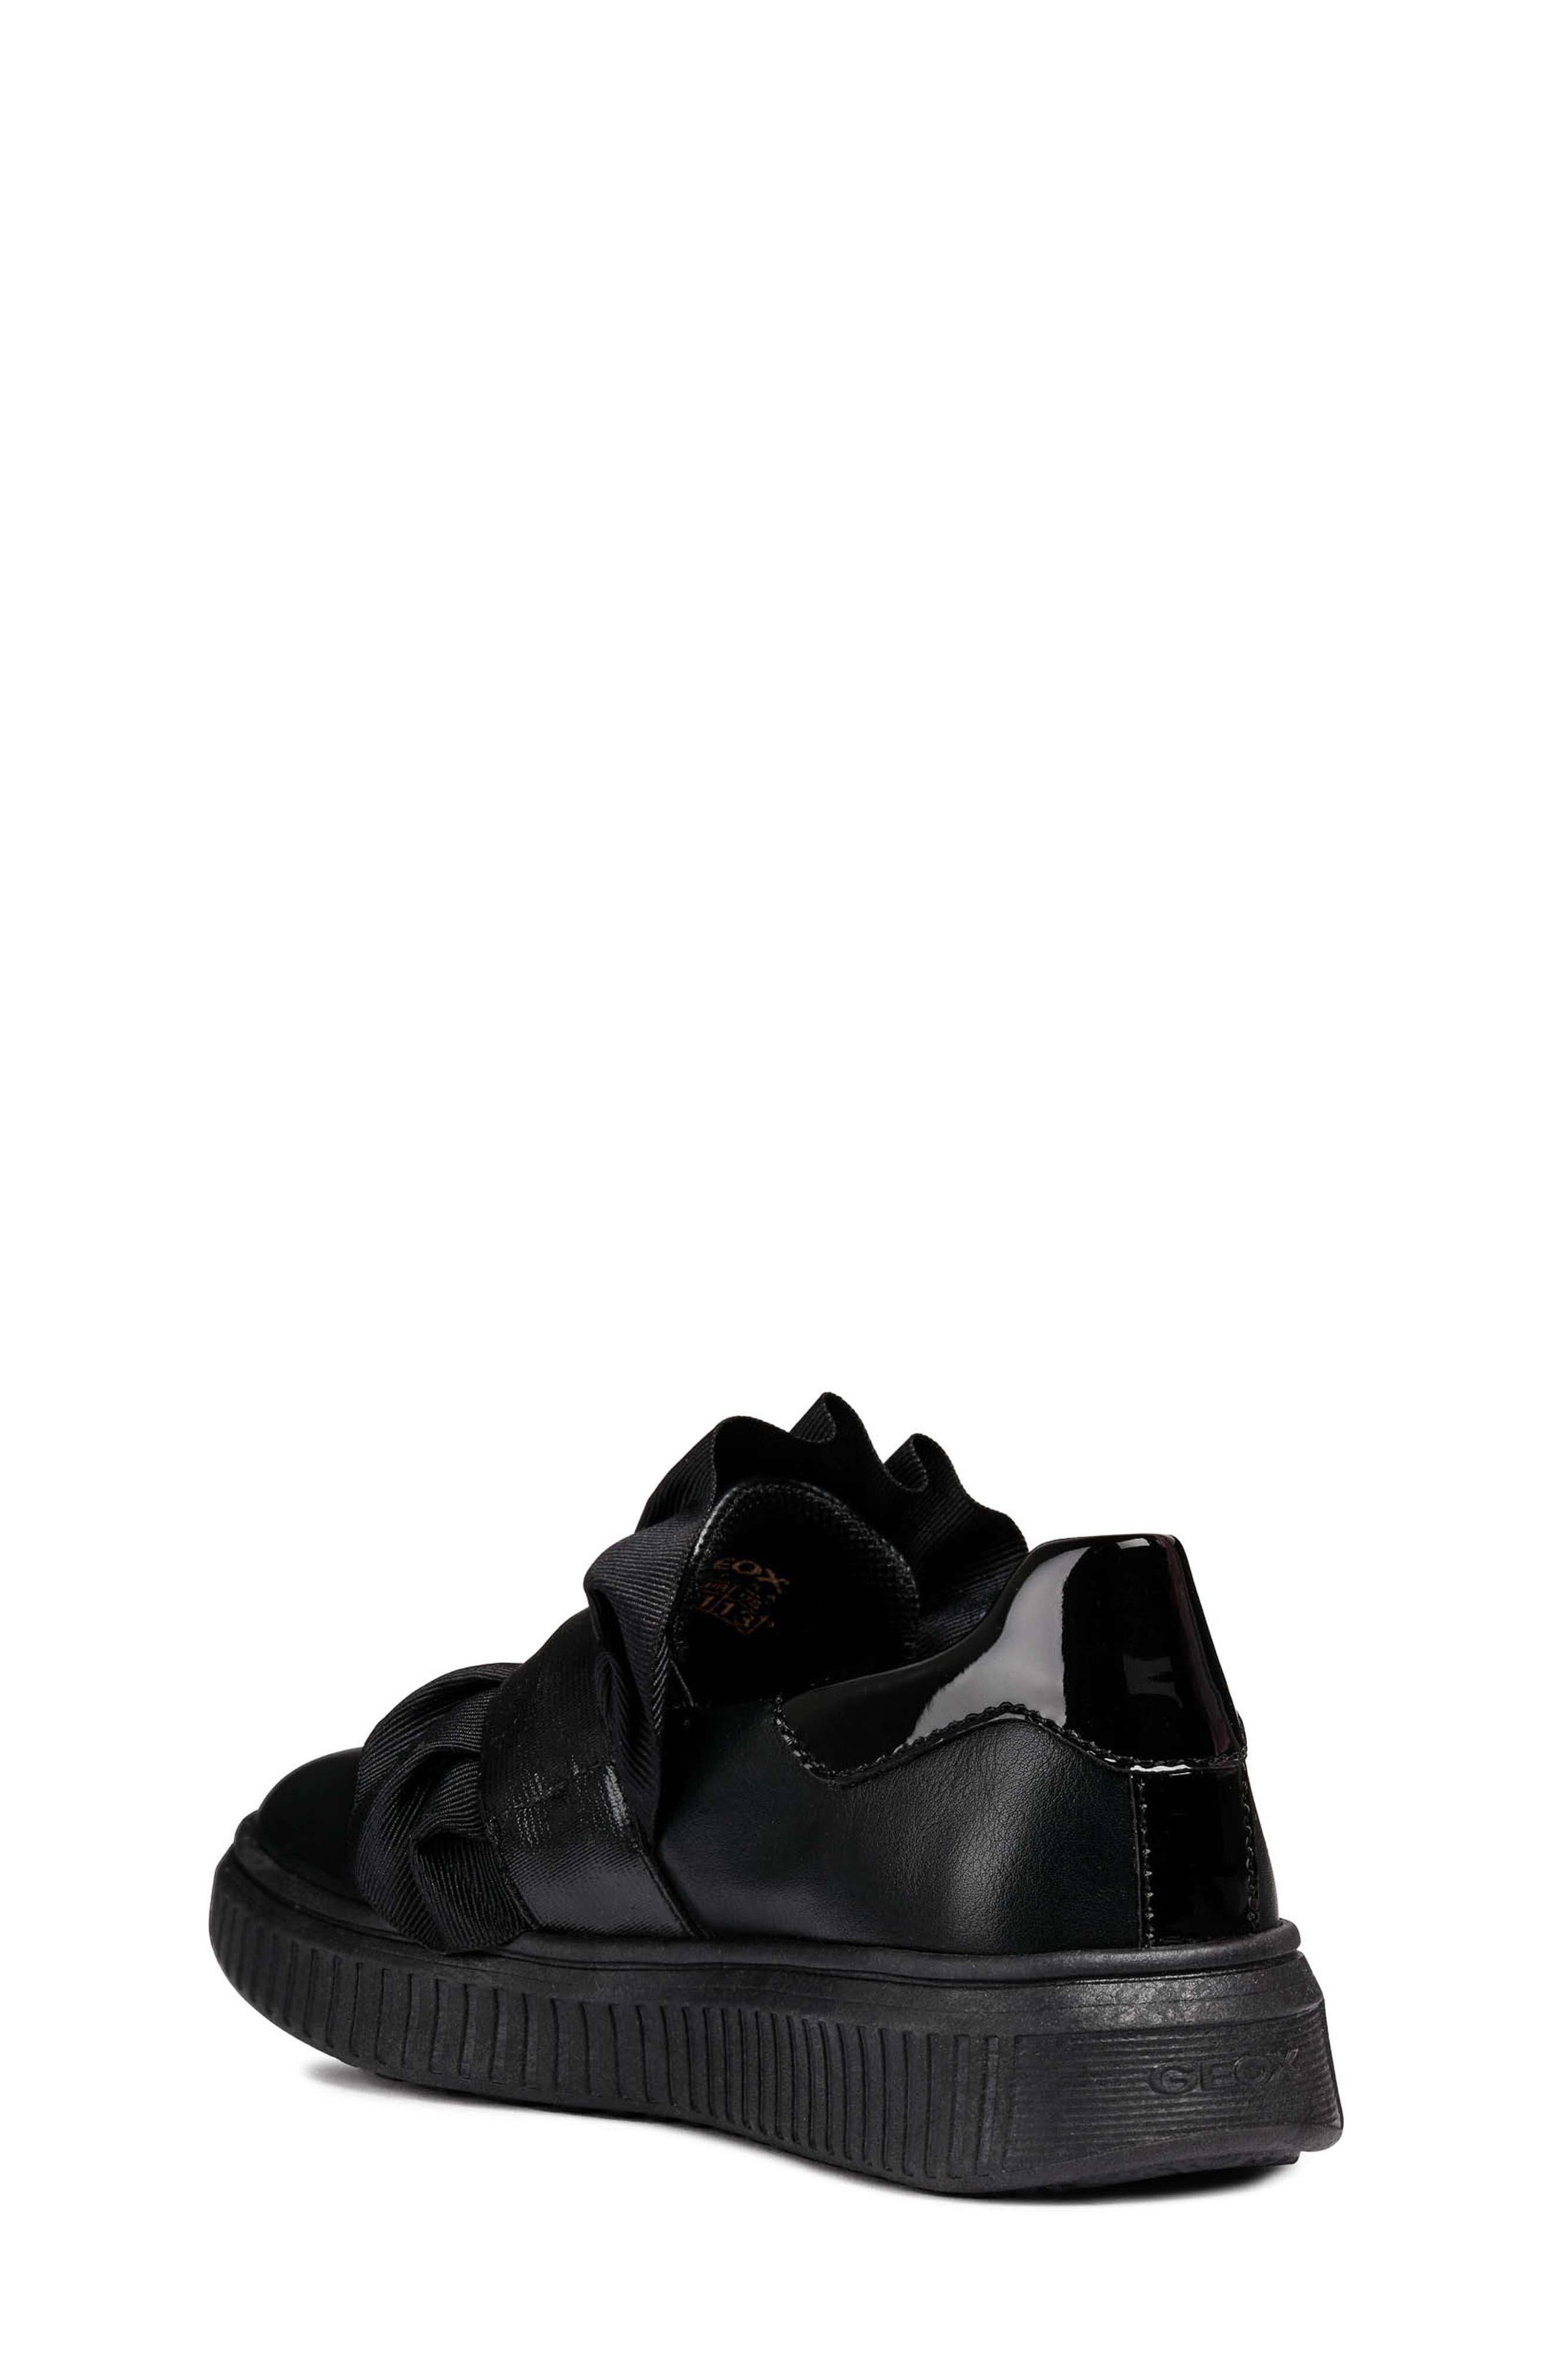 Disco Mix Slip-On Sneaker,                             Alternate thumbnail 2, color,                             BLACK